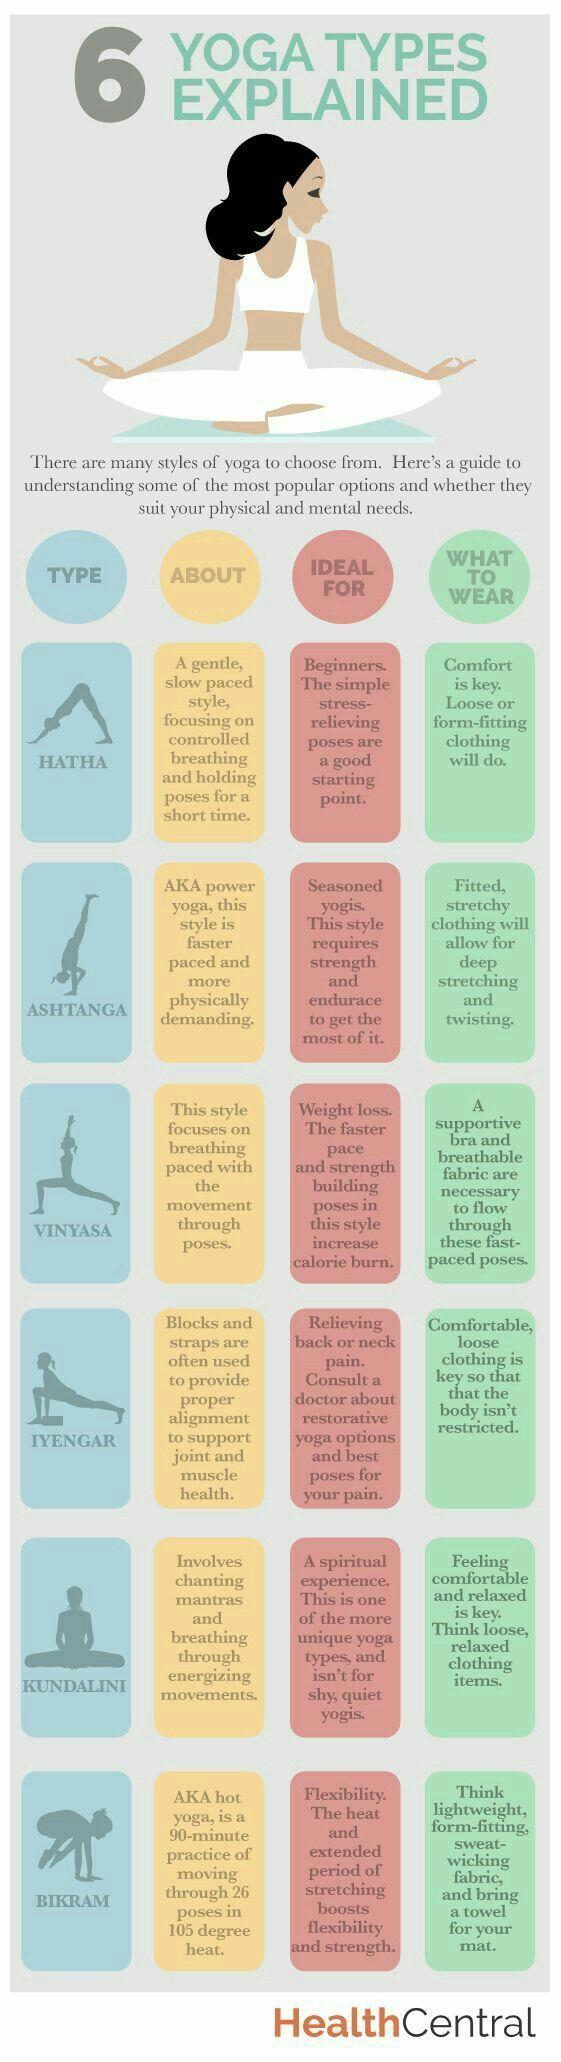 6 Yoga Types Explained (INFOGRAPHIC)